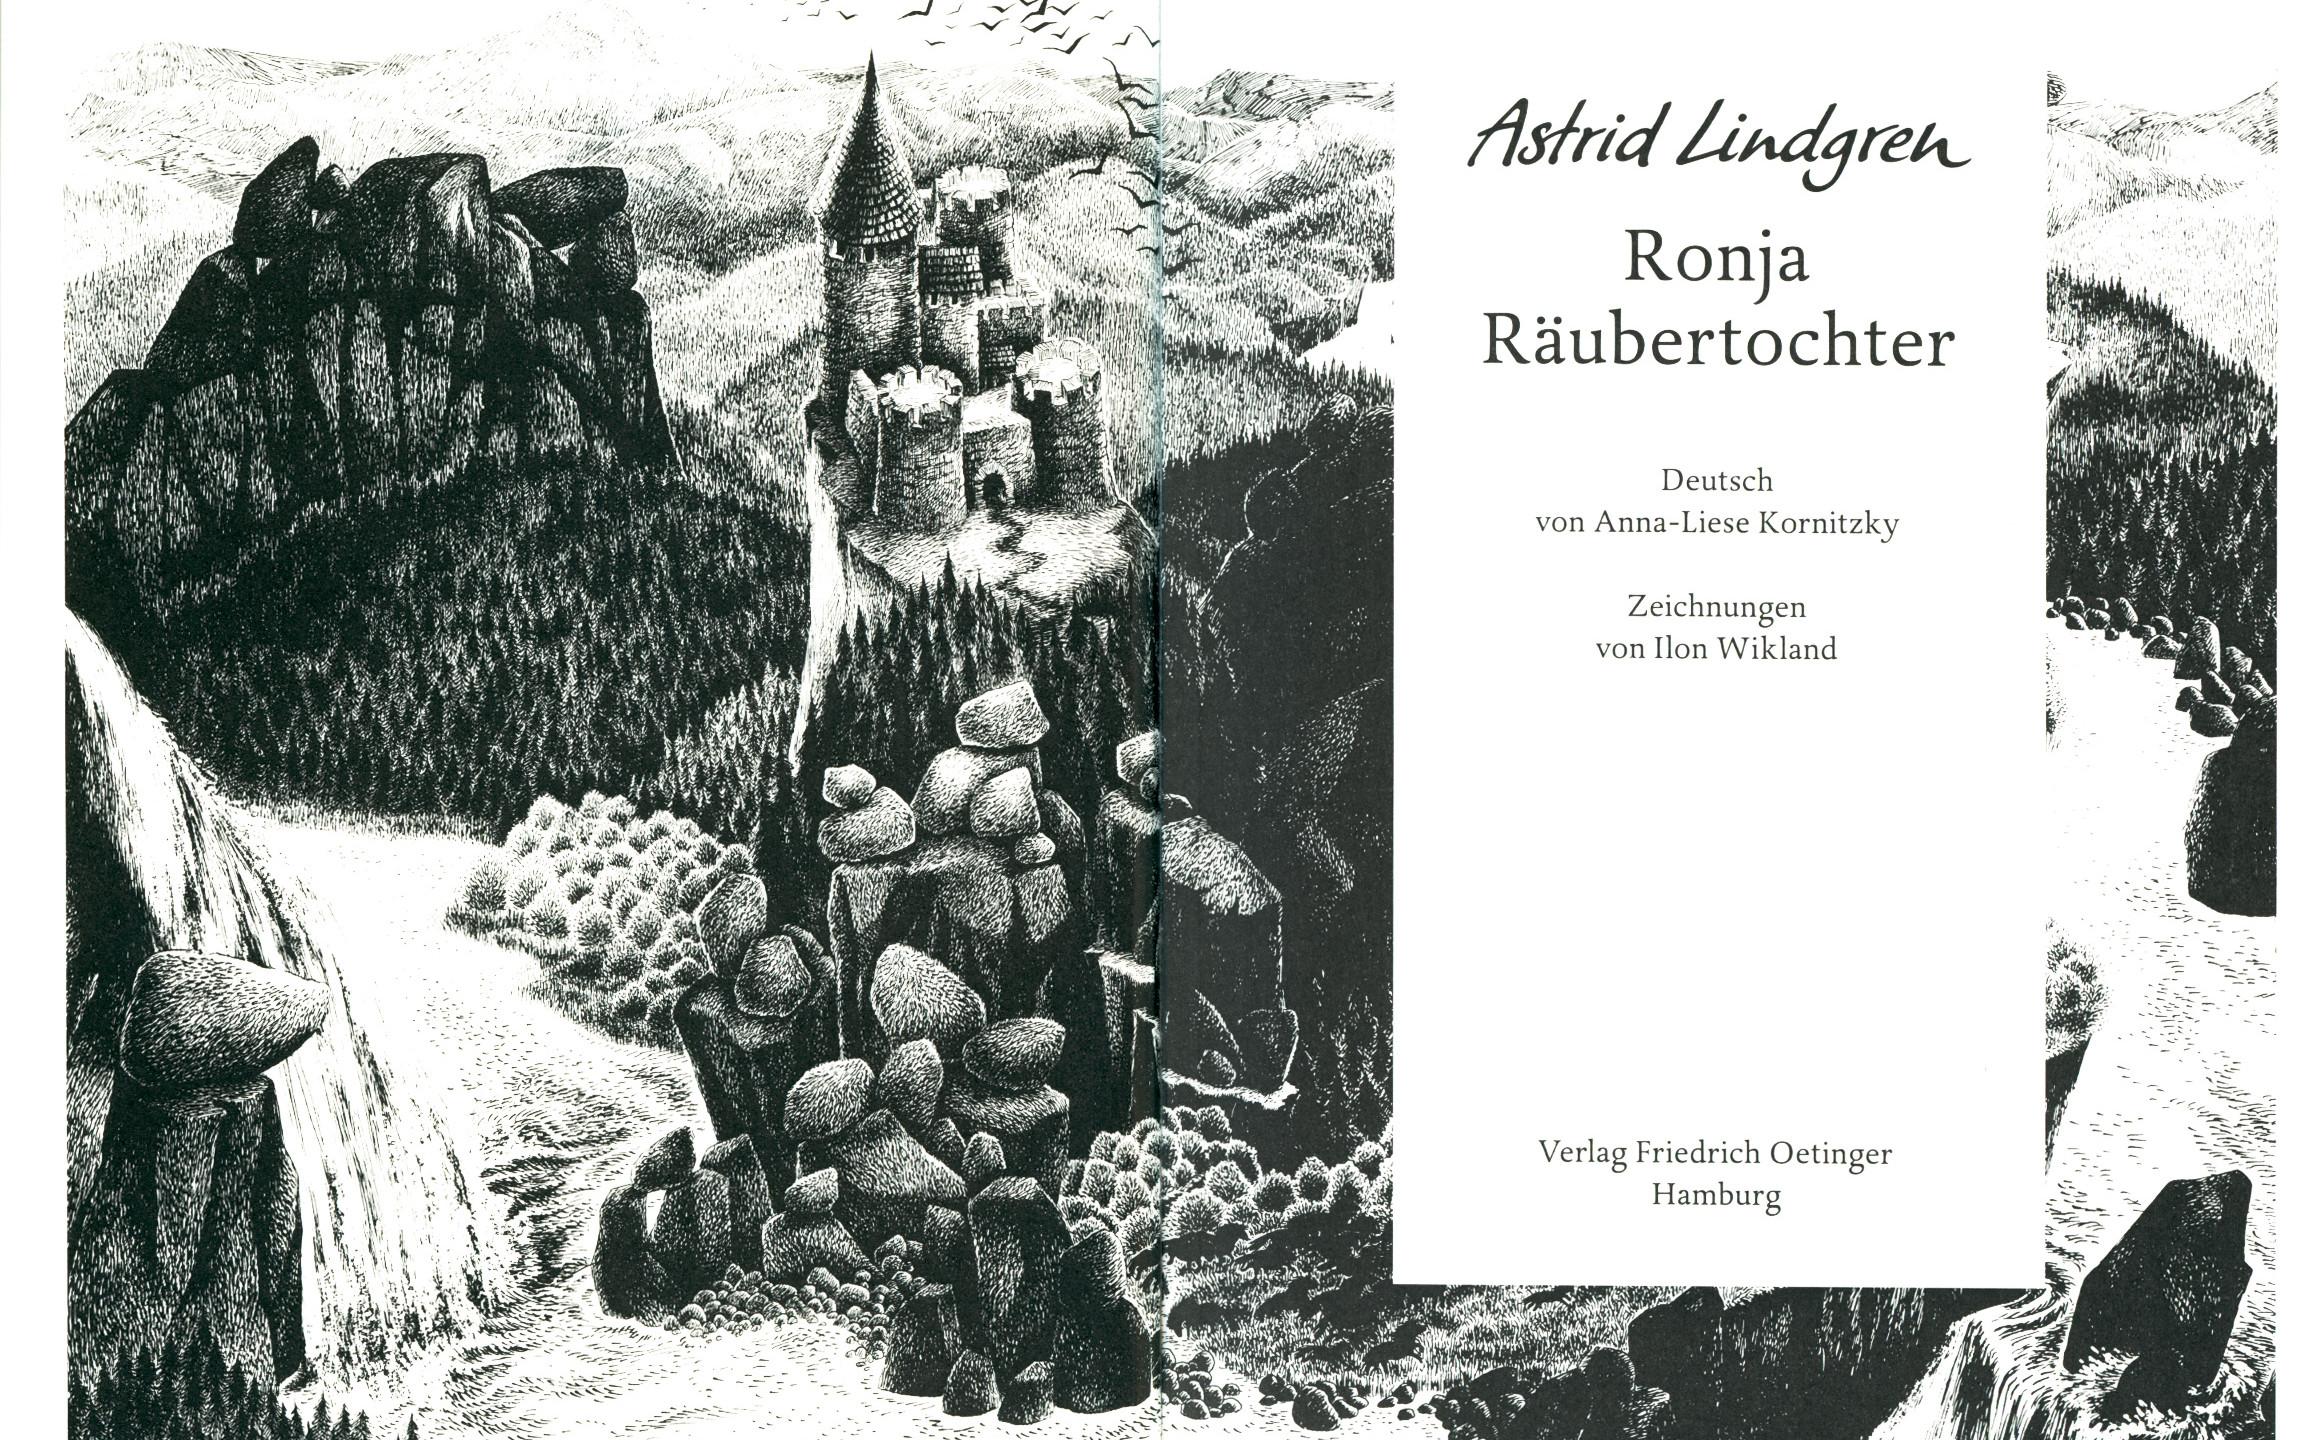 ronja_raubertochter_kinderbuch_illustration_von_ilon_wikland